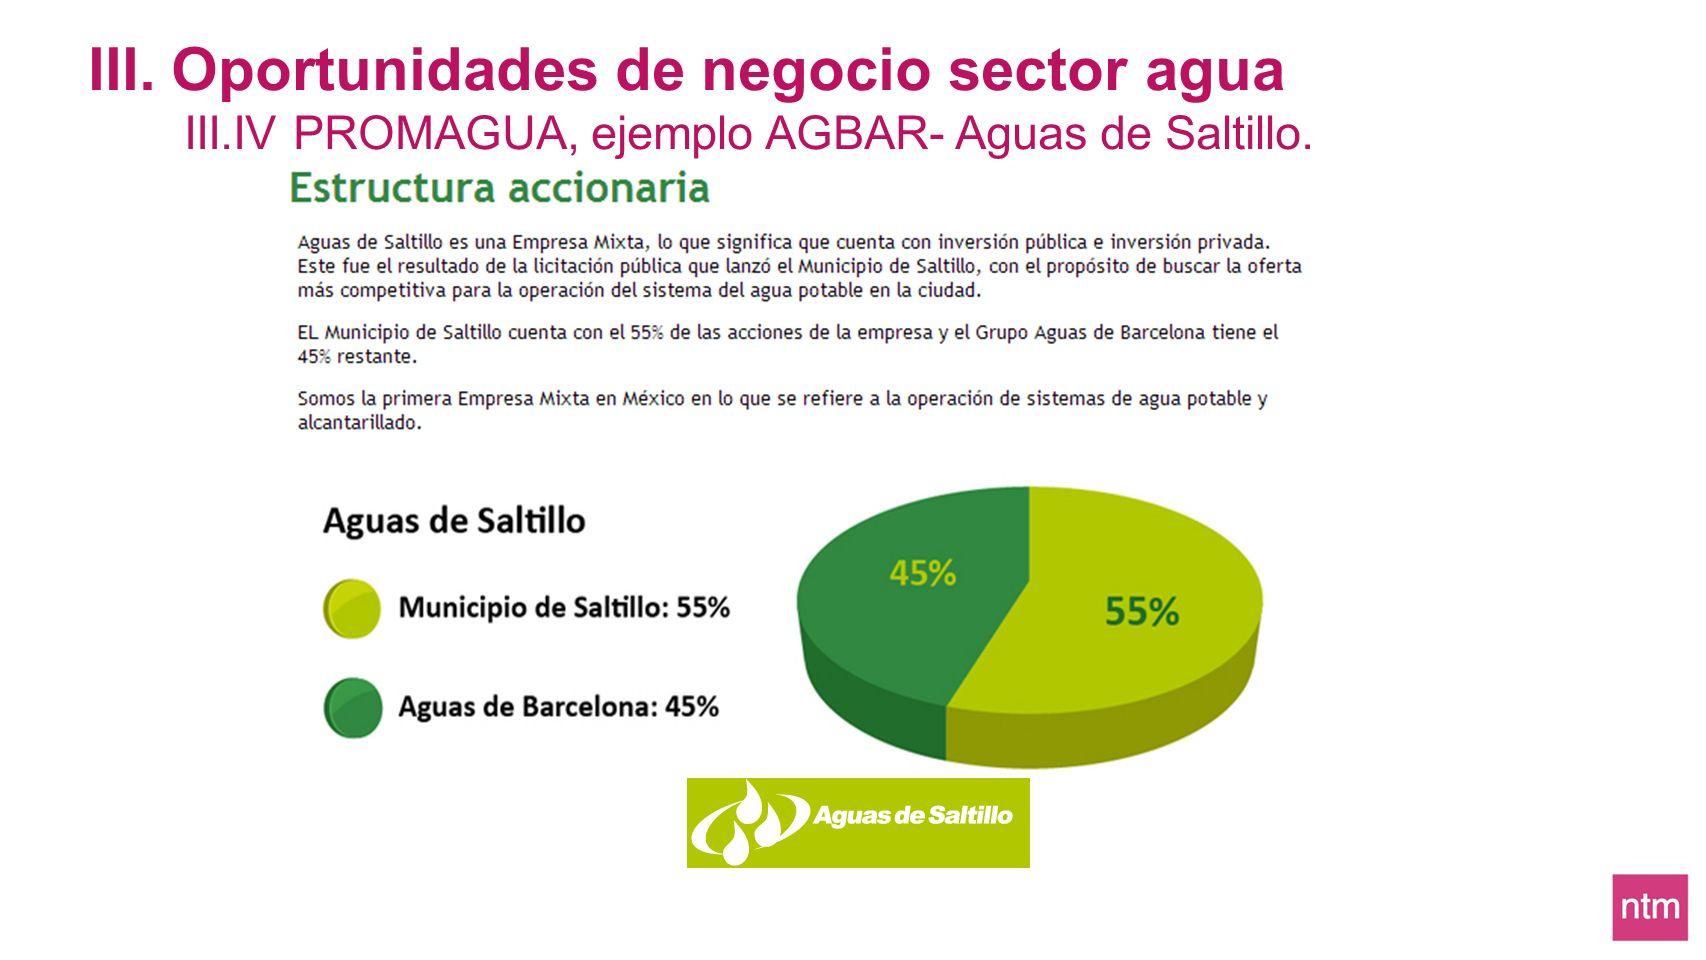 III. Oportunidades de negocio sector agua III.IV PROMAGUA, ejemplo AGBAR- Aguas de Saltillo.